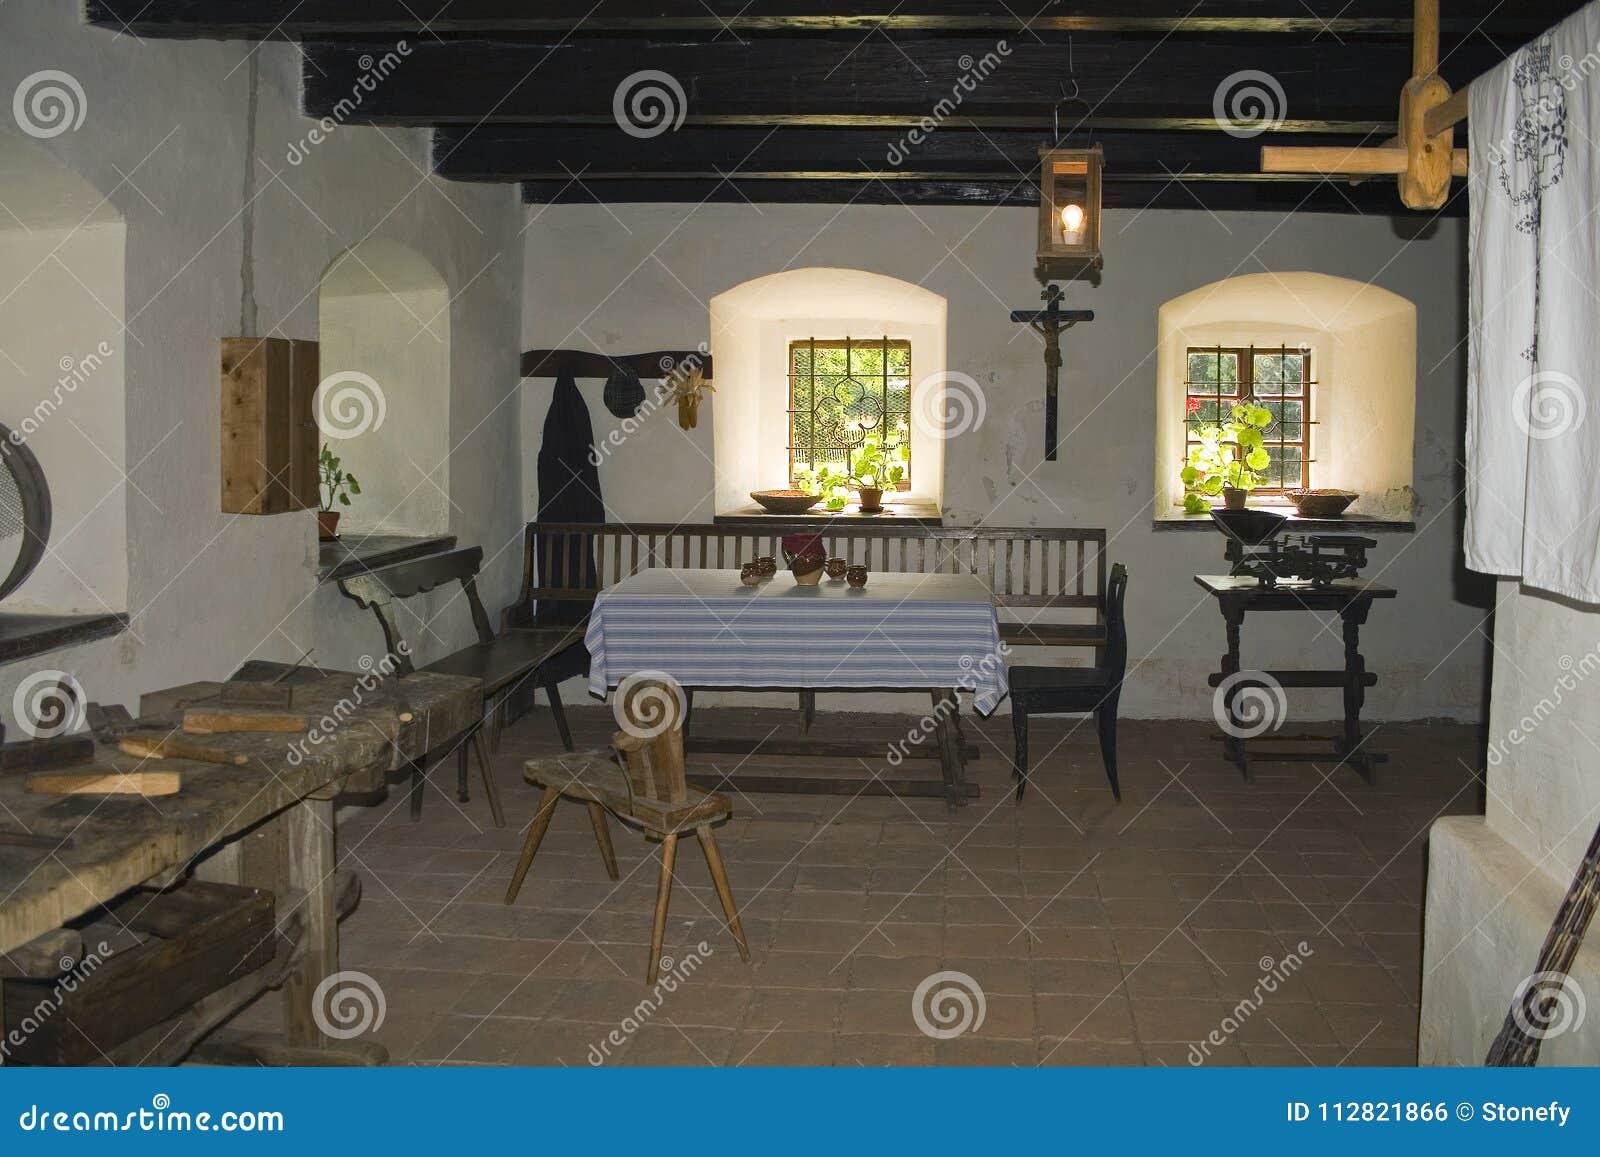 Sala de estar rústica interior por la ventana